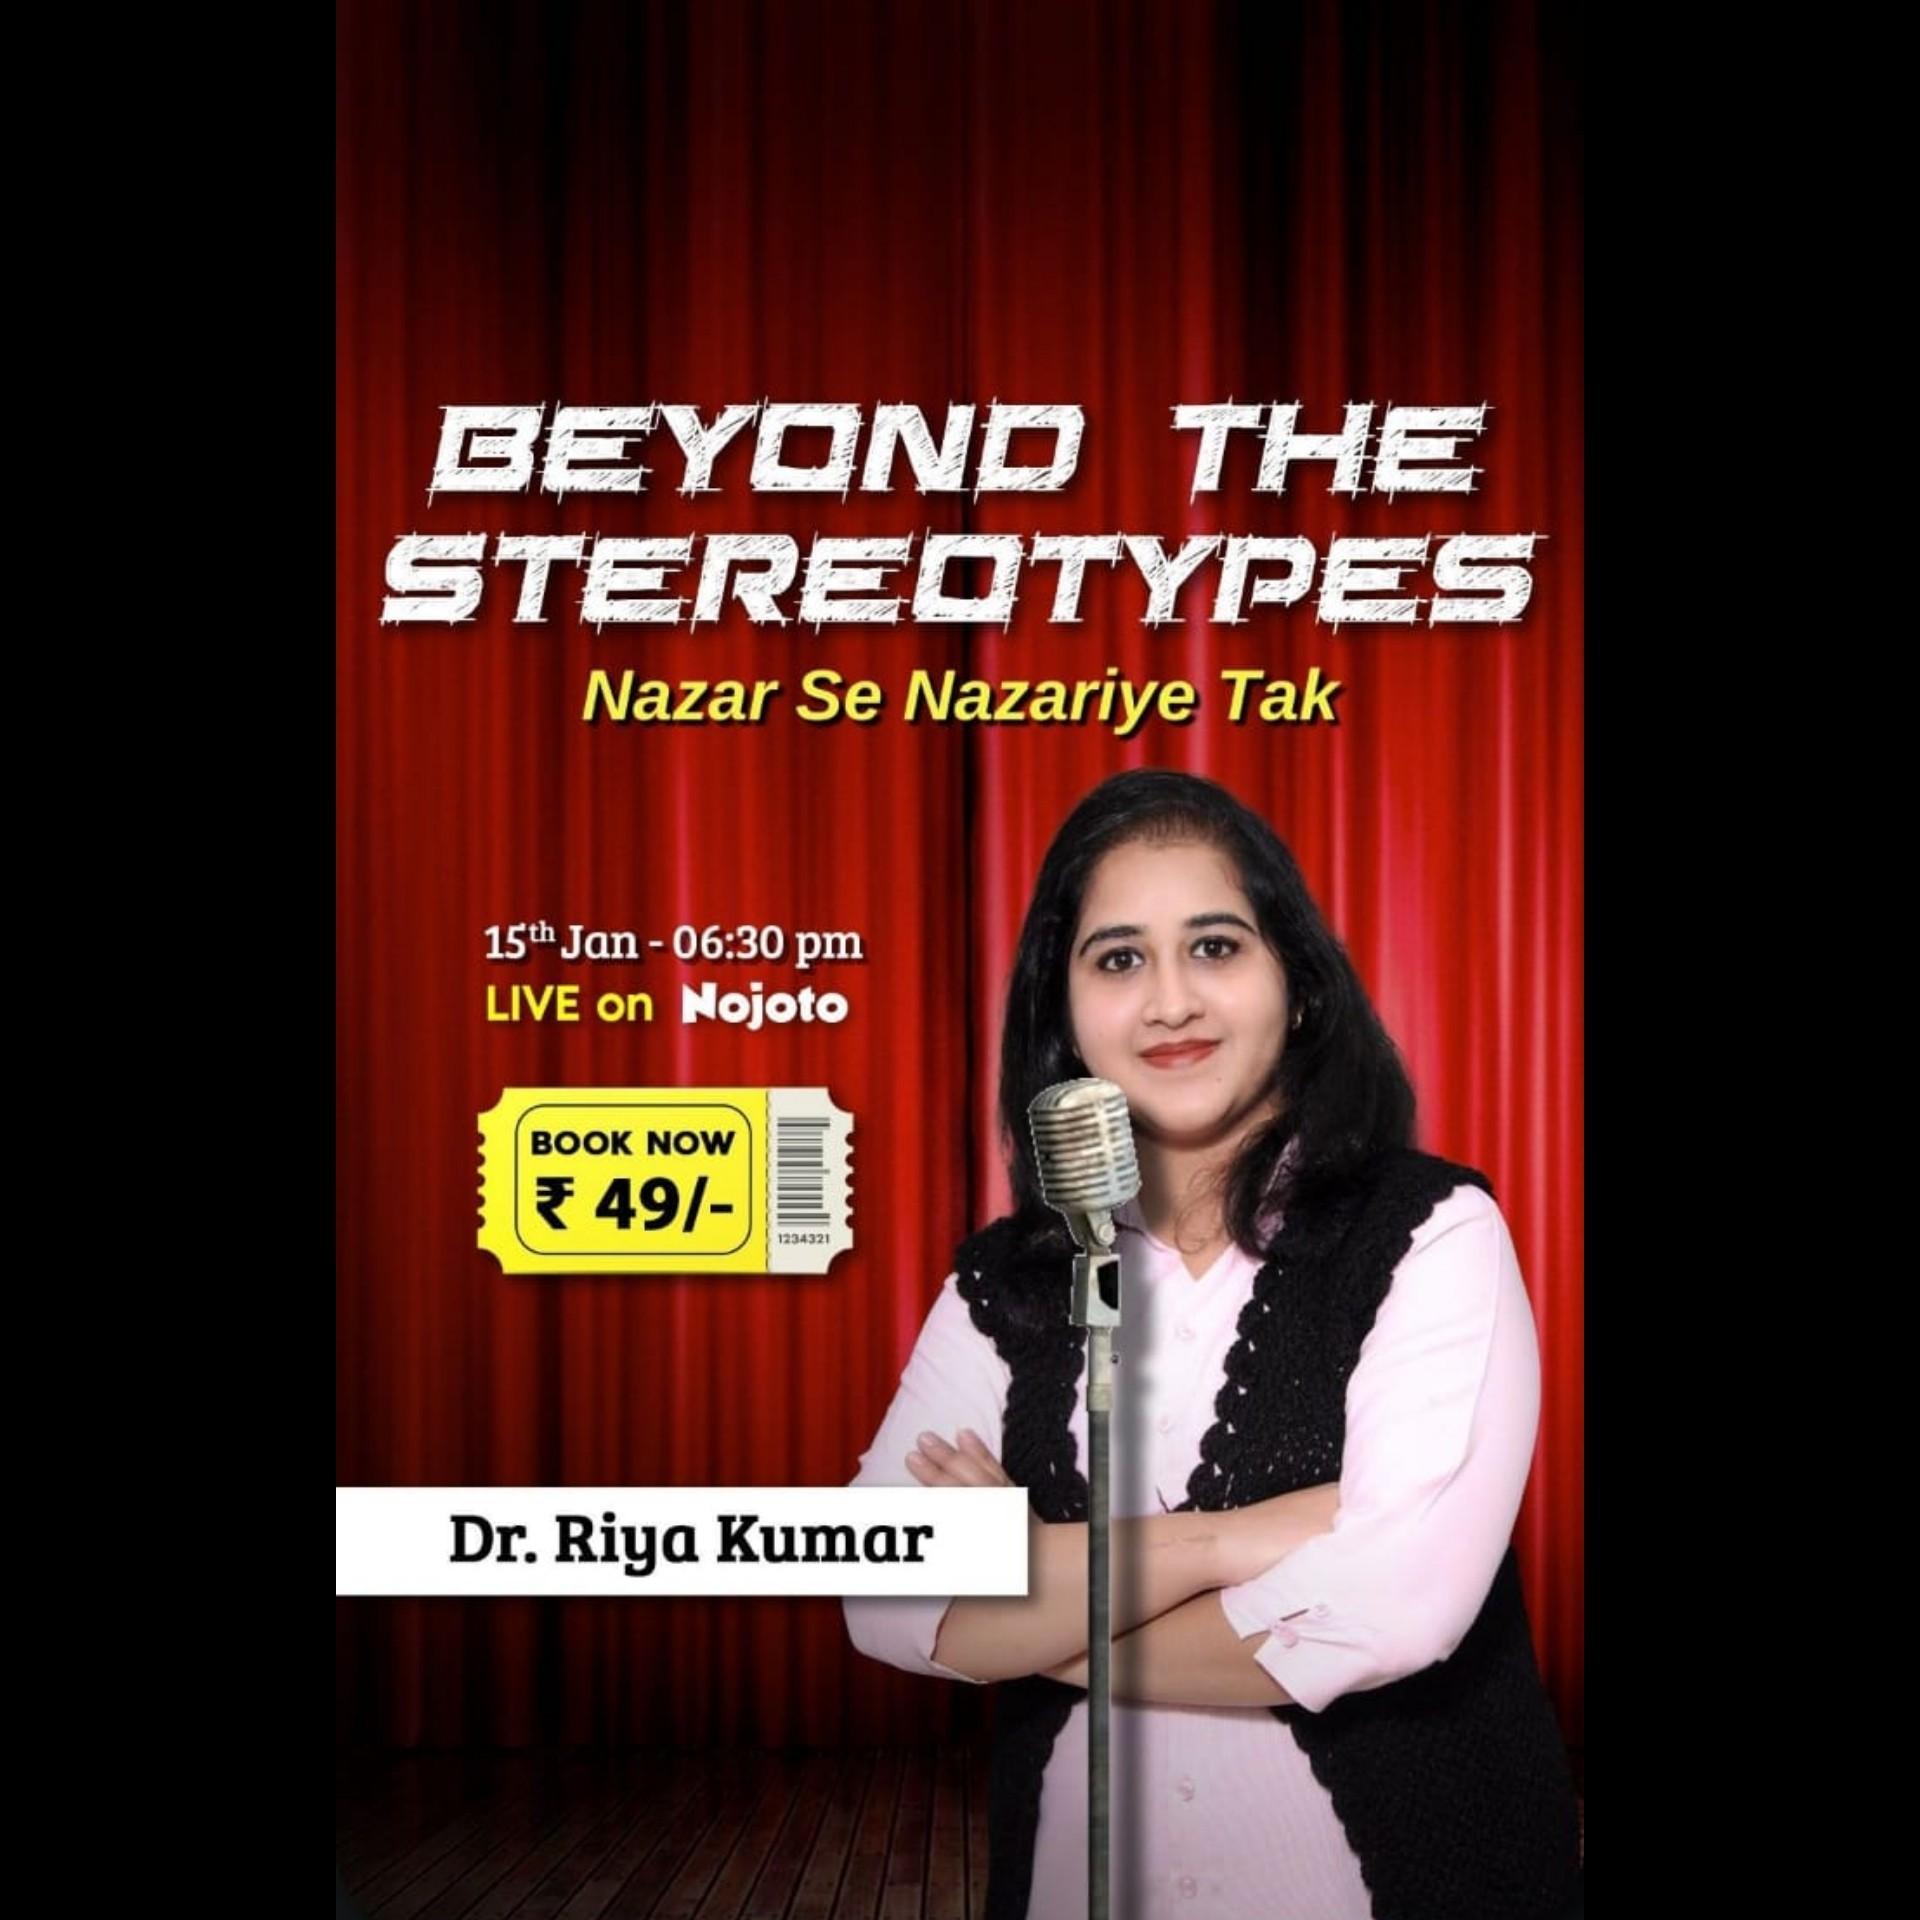 Dr Riya Kumar AKA shookRiya